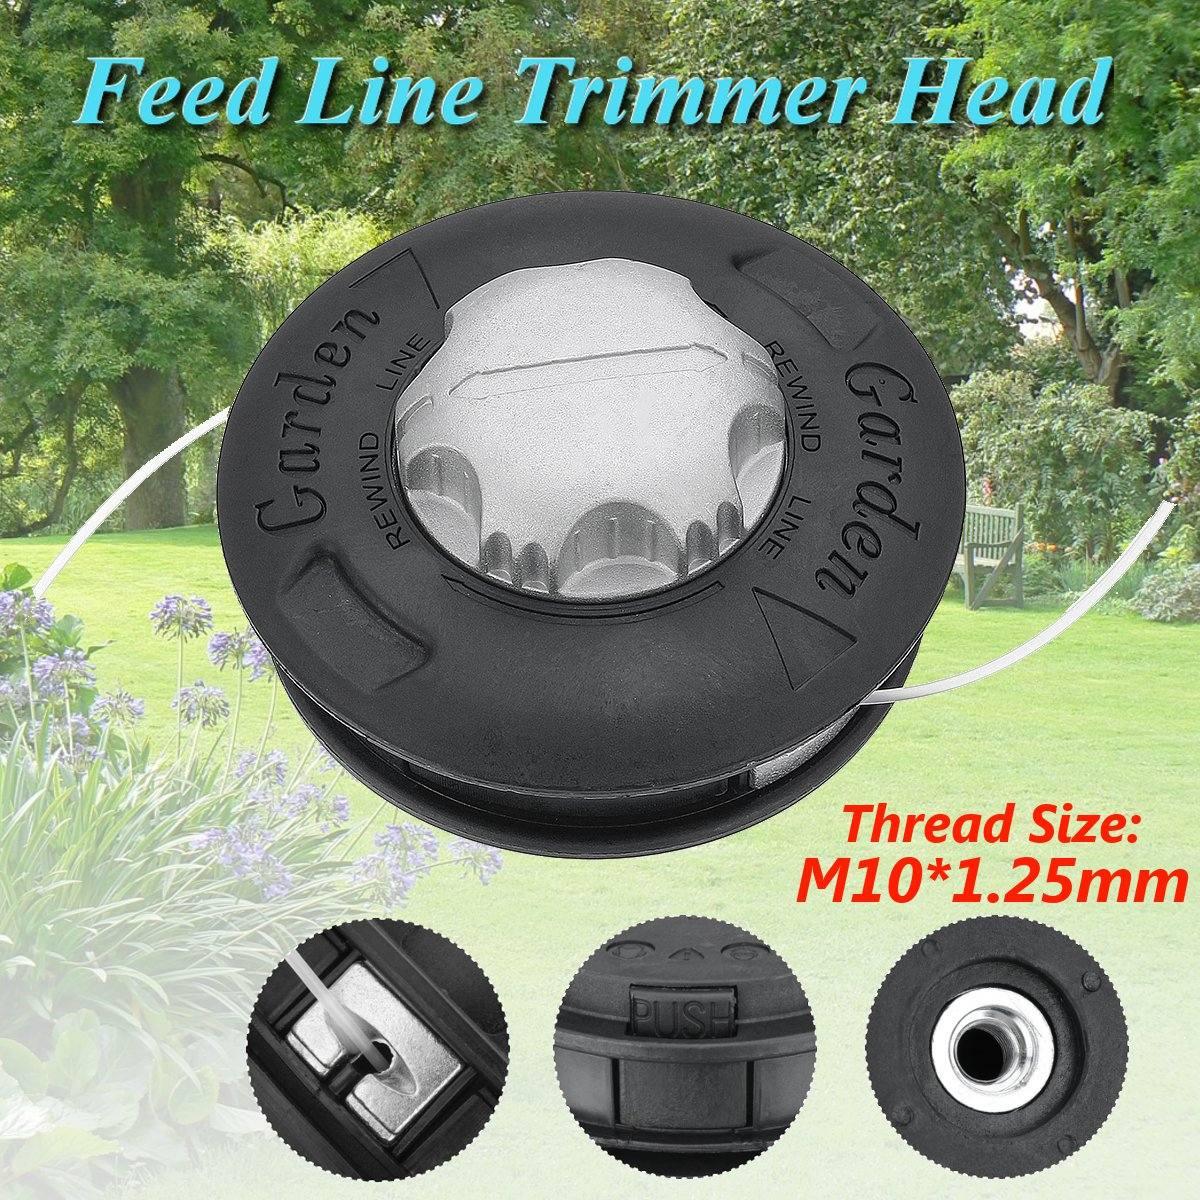 M10 2 Lines Cutter Head Aluminum Nylon Brush Mower  Bump Spool Grass Trimmer Thread Line String Saw Grass Brush Mower Universal